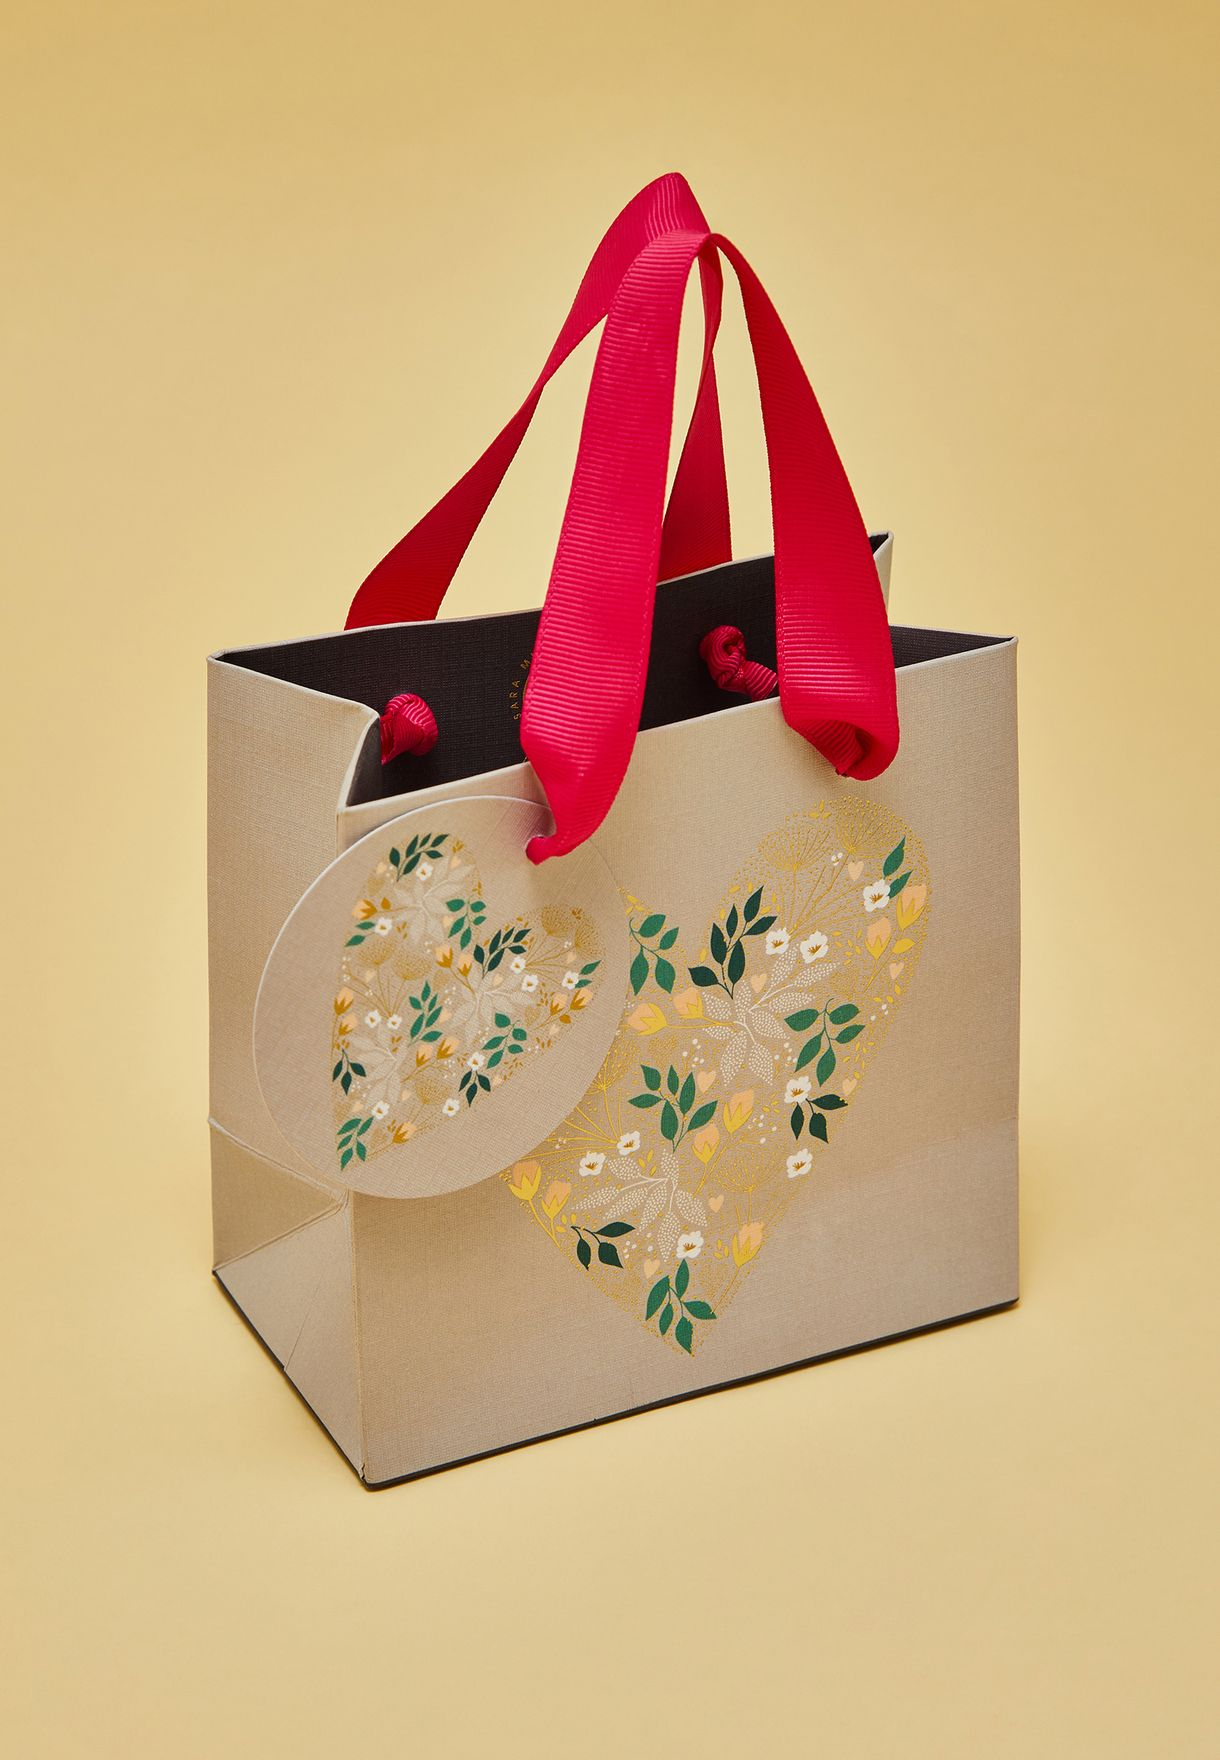 شنطة هدايا بطبعات ازهار